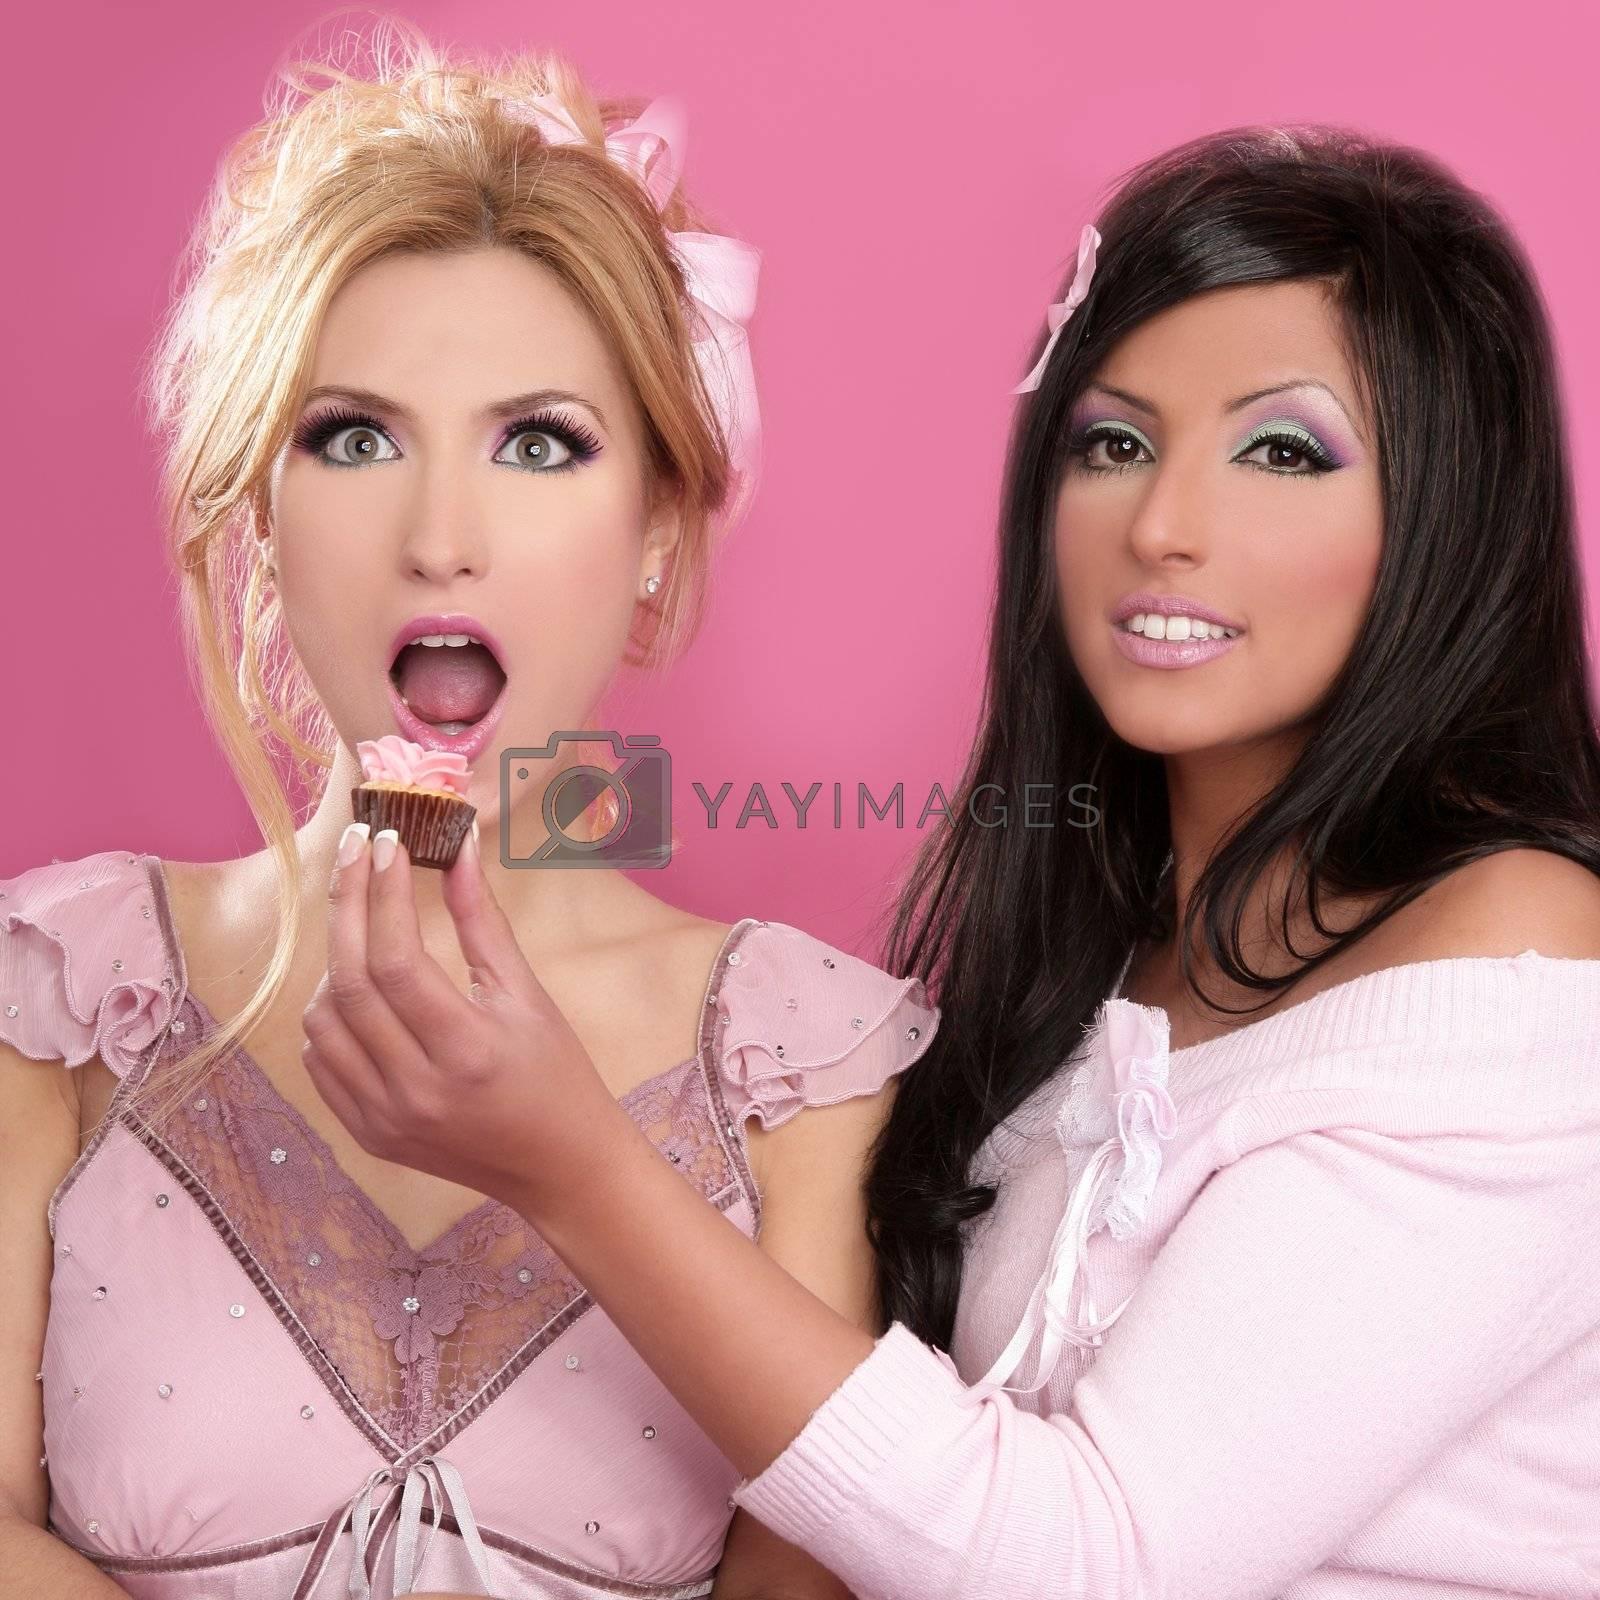 barbie beautiful girls eating diet sweet on pink background